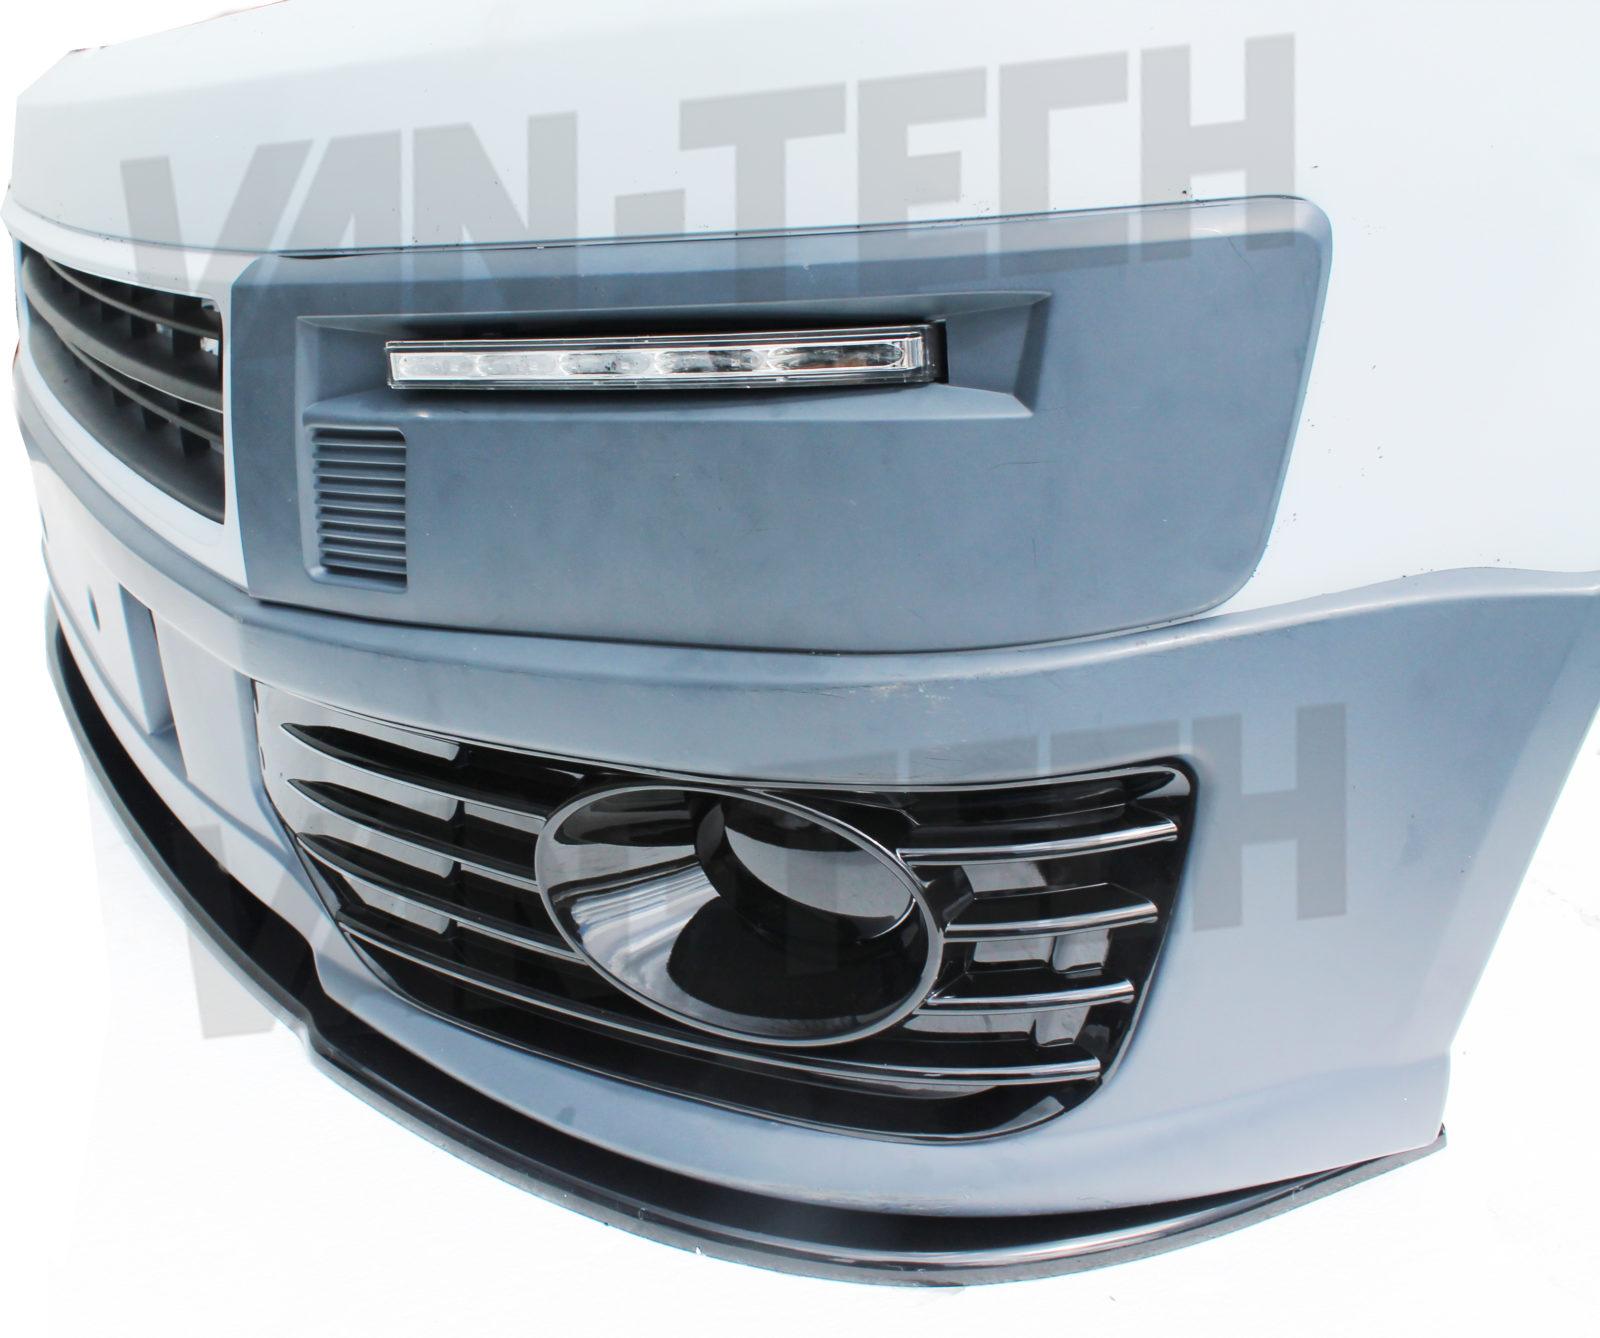 Conversion Van Models >> VW Transporter T5 Lower Front End Conversion Styling kit | Van-Tech